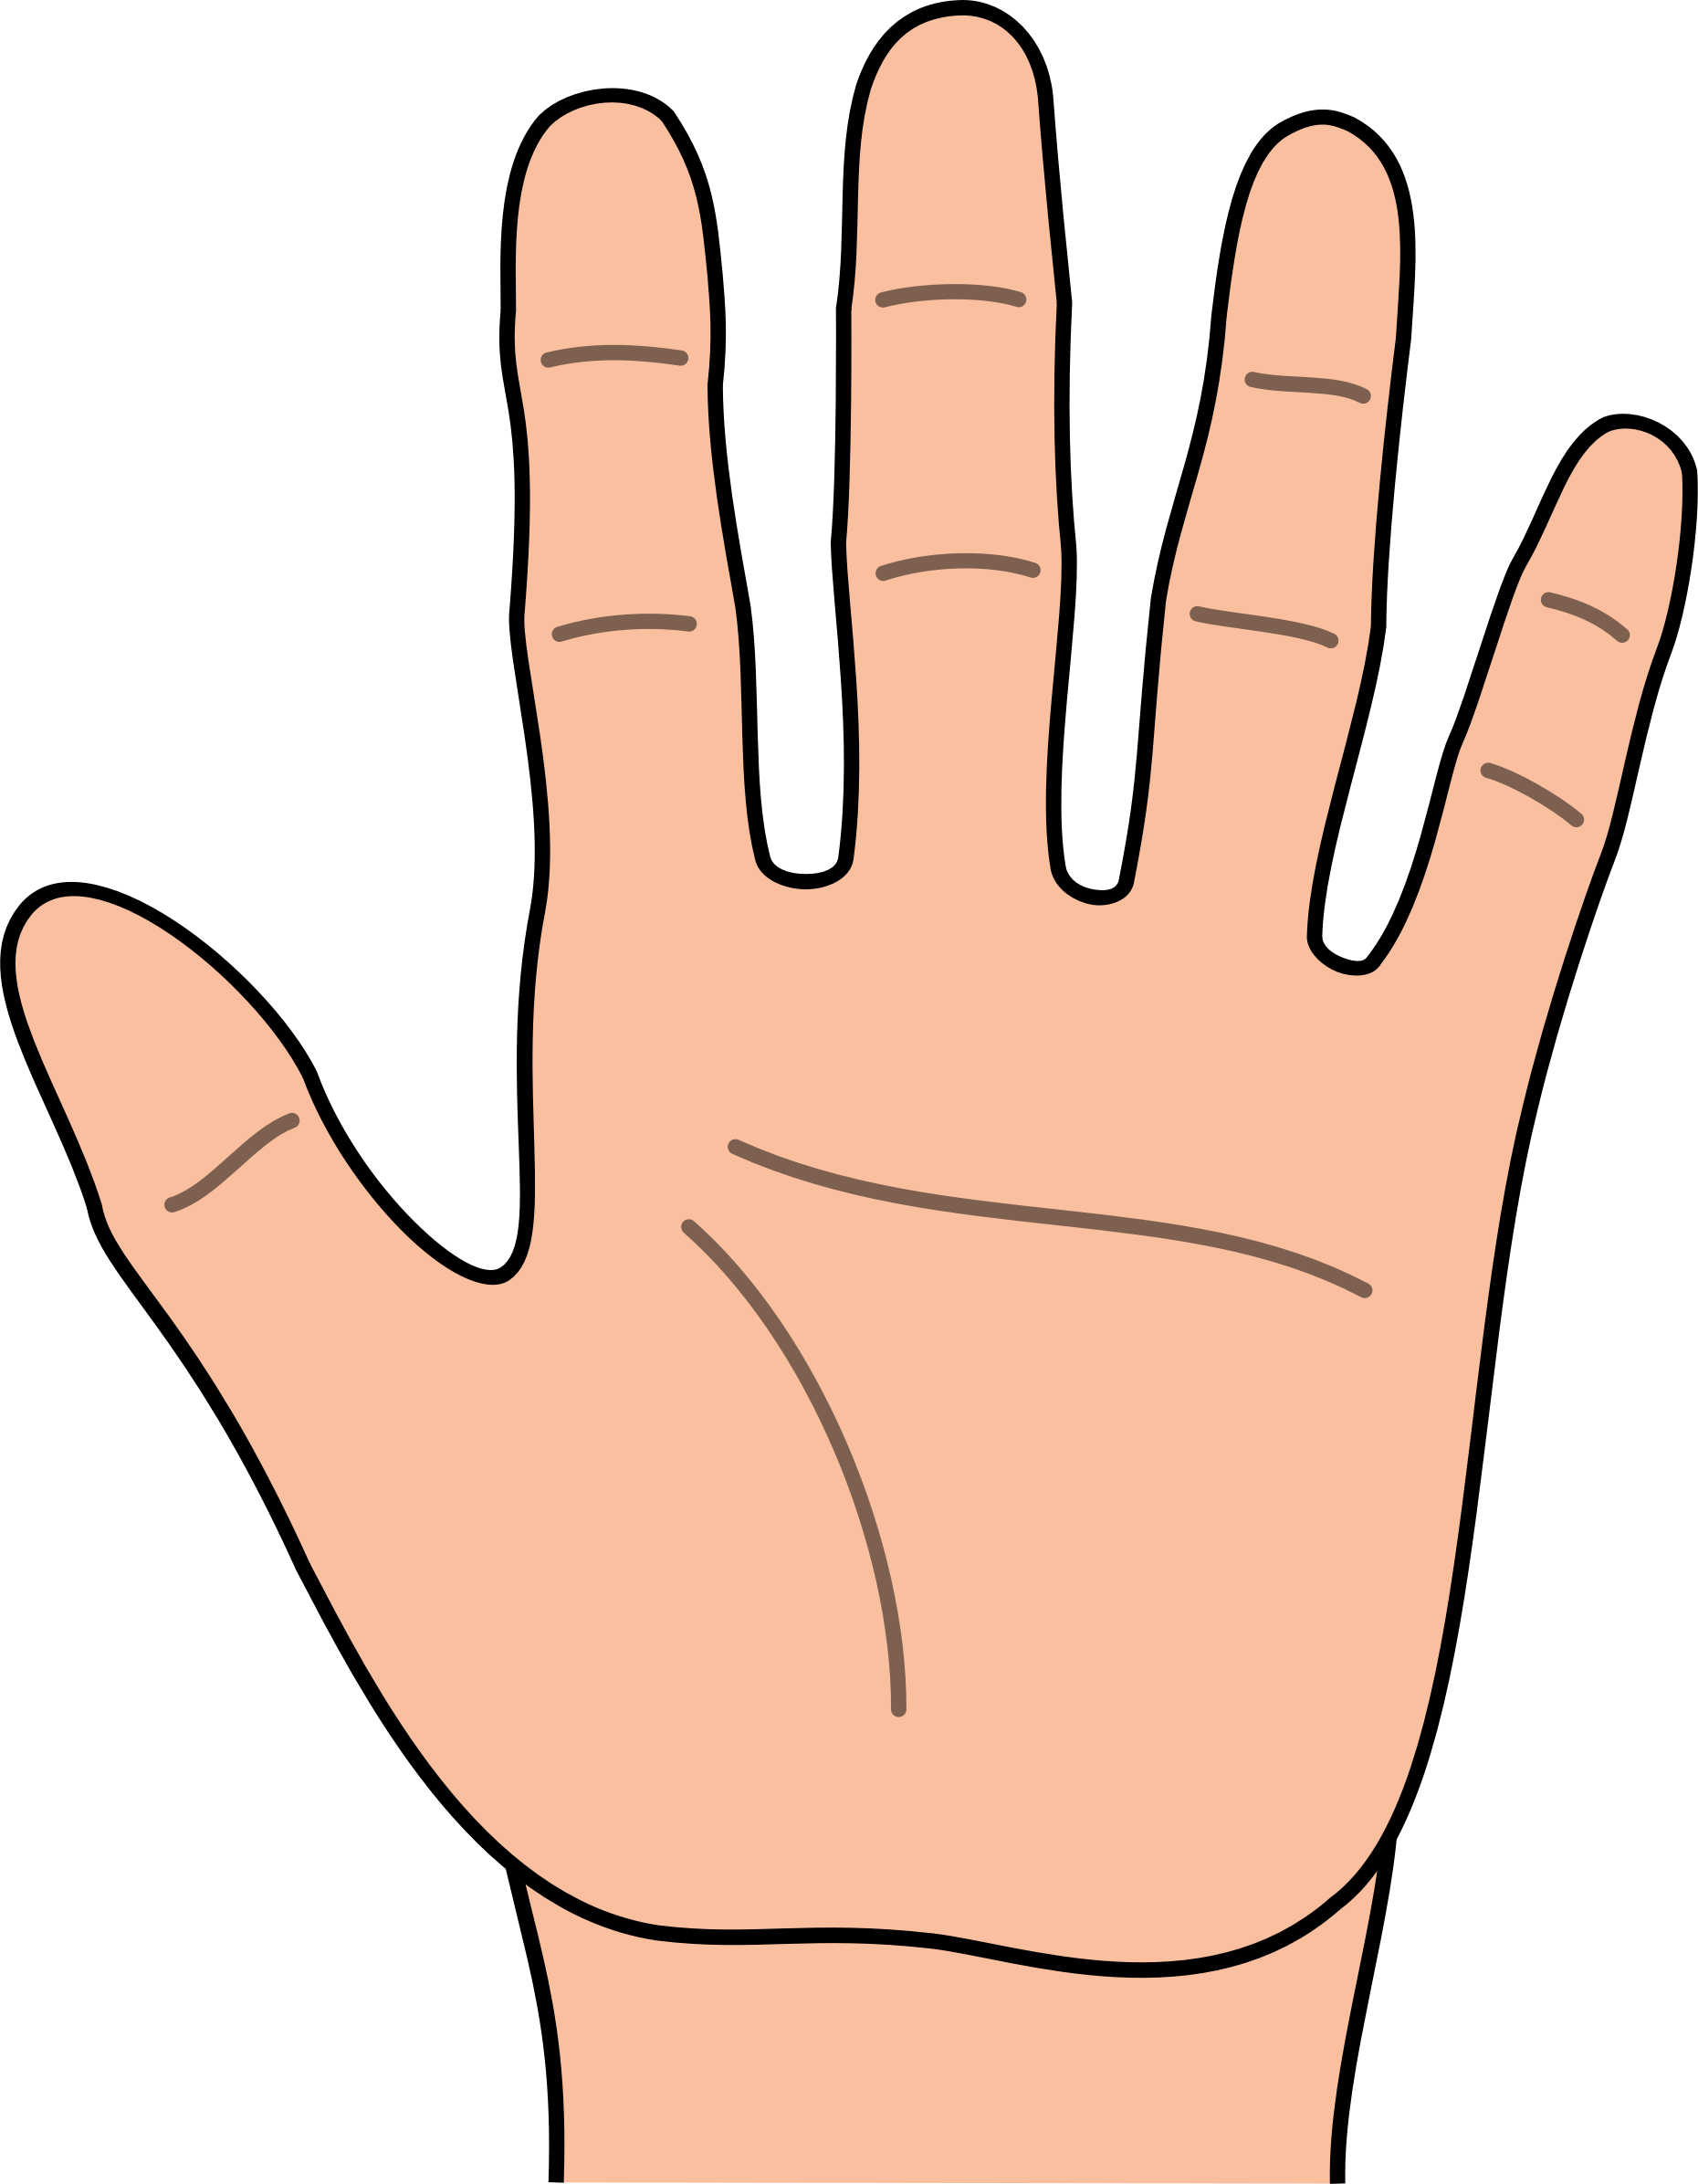 Hands Hand Clip Art Free Clipart Images-Hands hand clip art free clipart images-11